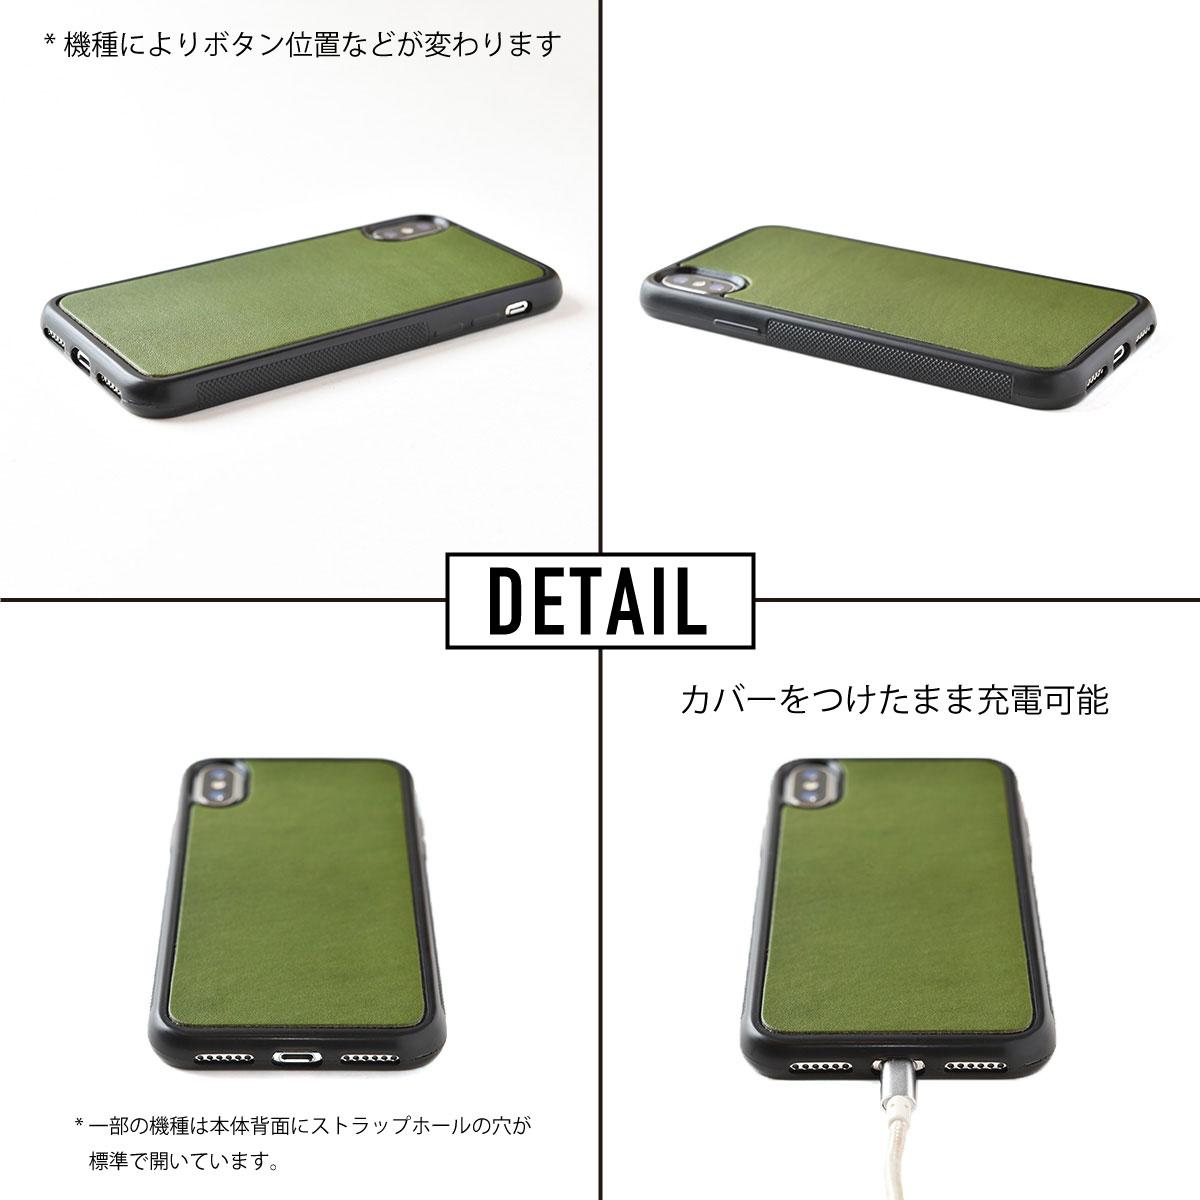 iPhoneOpenCase:   Design E_4:ミニマーク刻印(スター)+名入れ